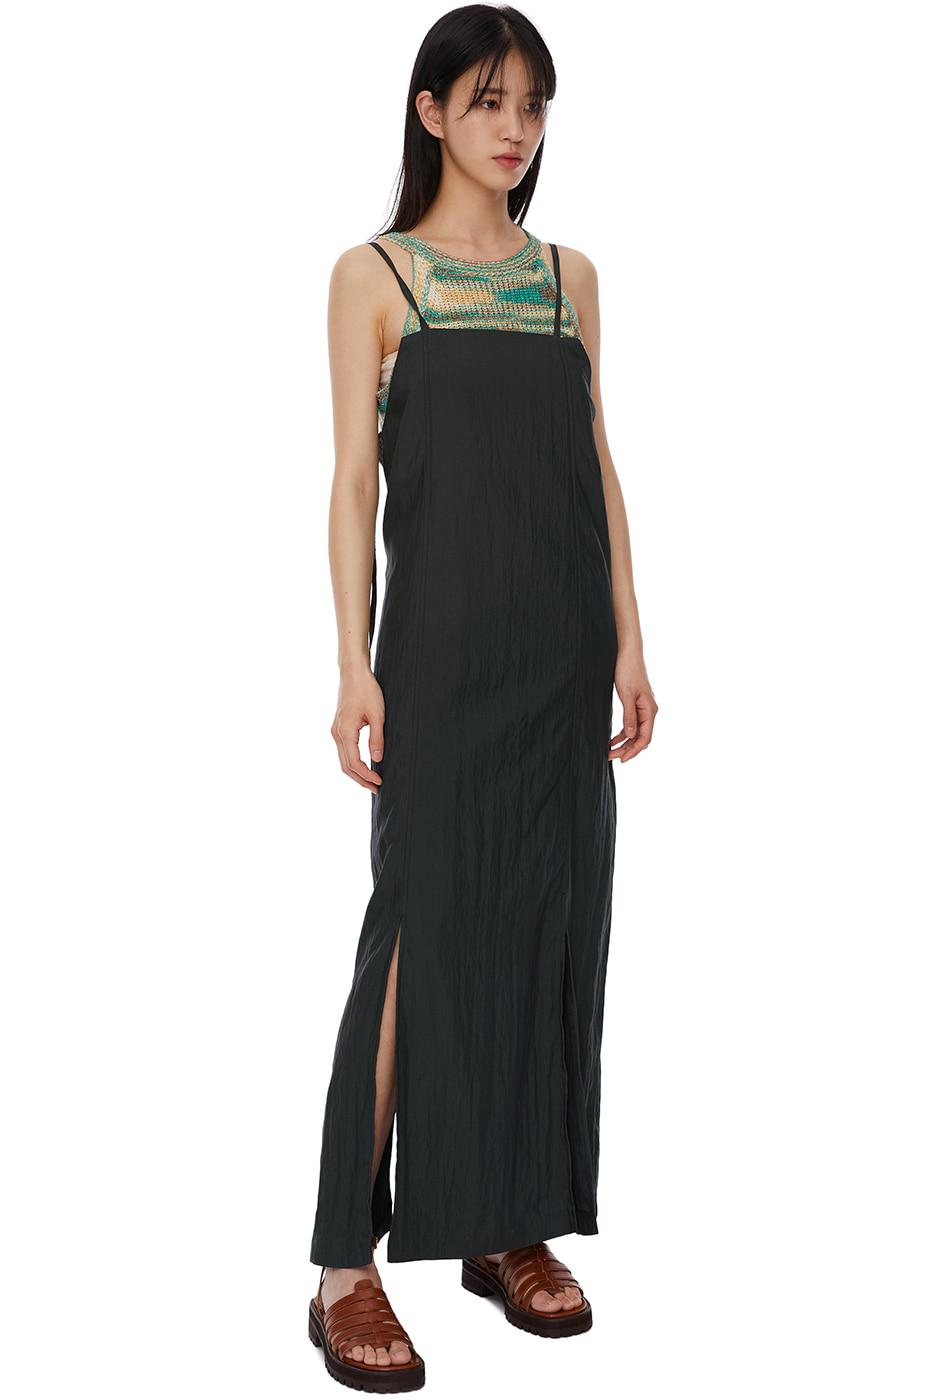 Nylon Ring Strap Long Dress